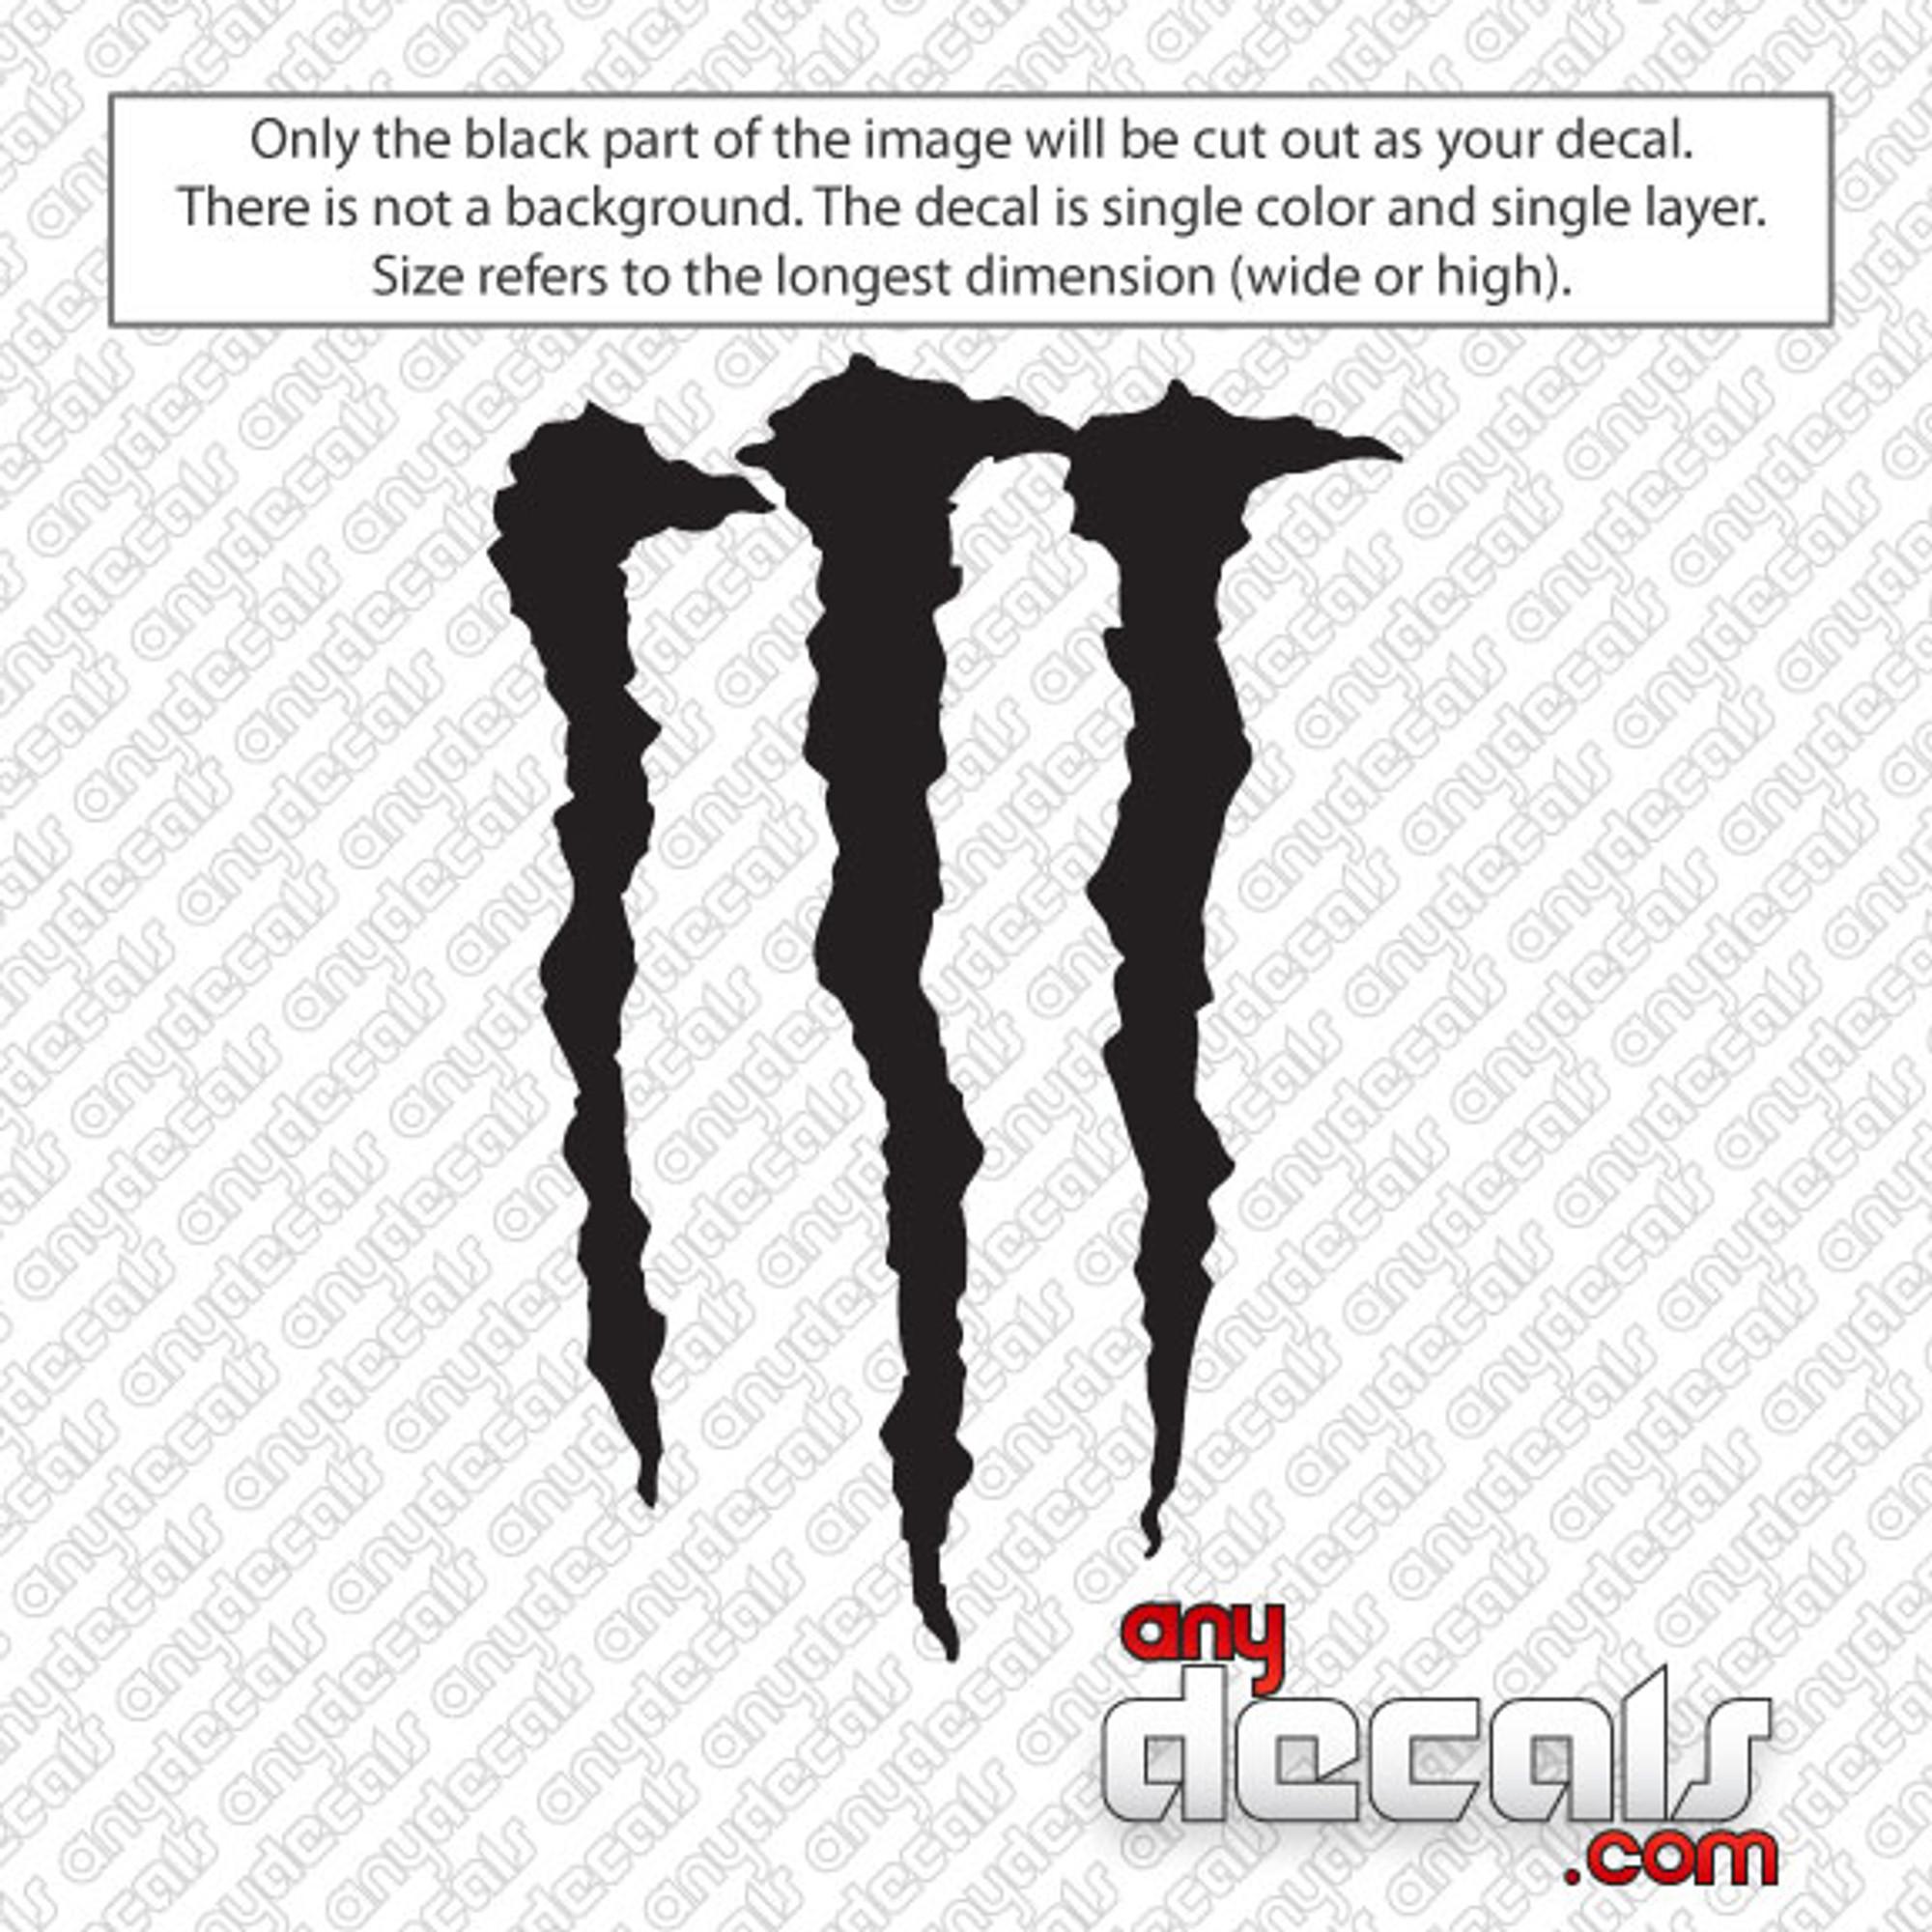 car decals car stickers monster energy 39 m 39 car decal. Black Bedroom Furniture Sets. Home Design Ideas